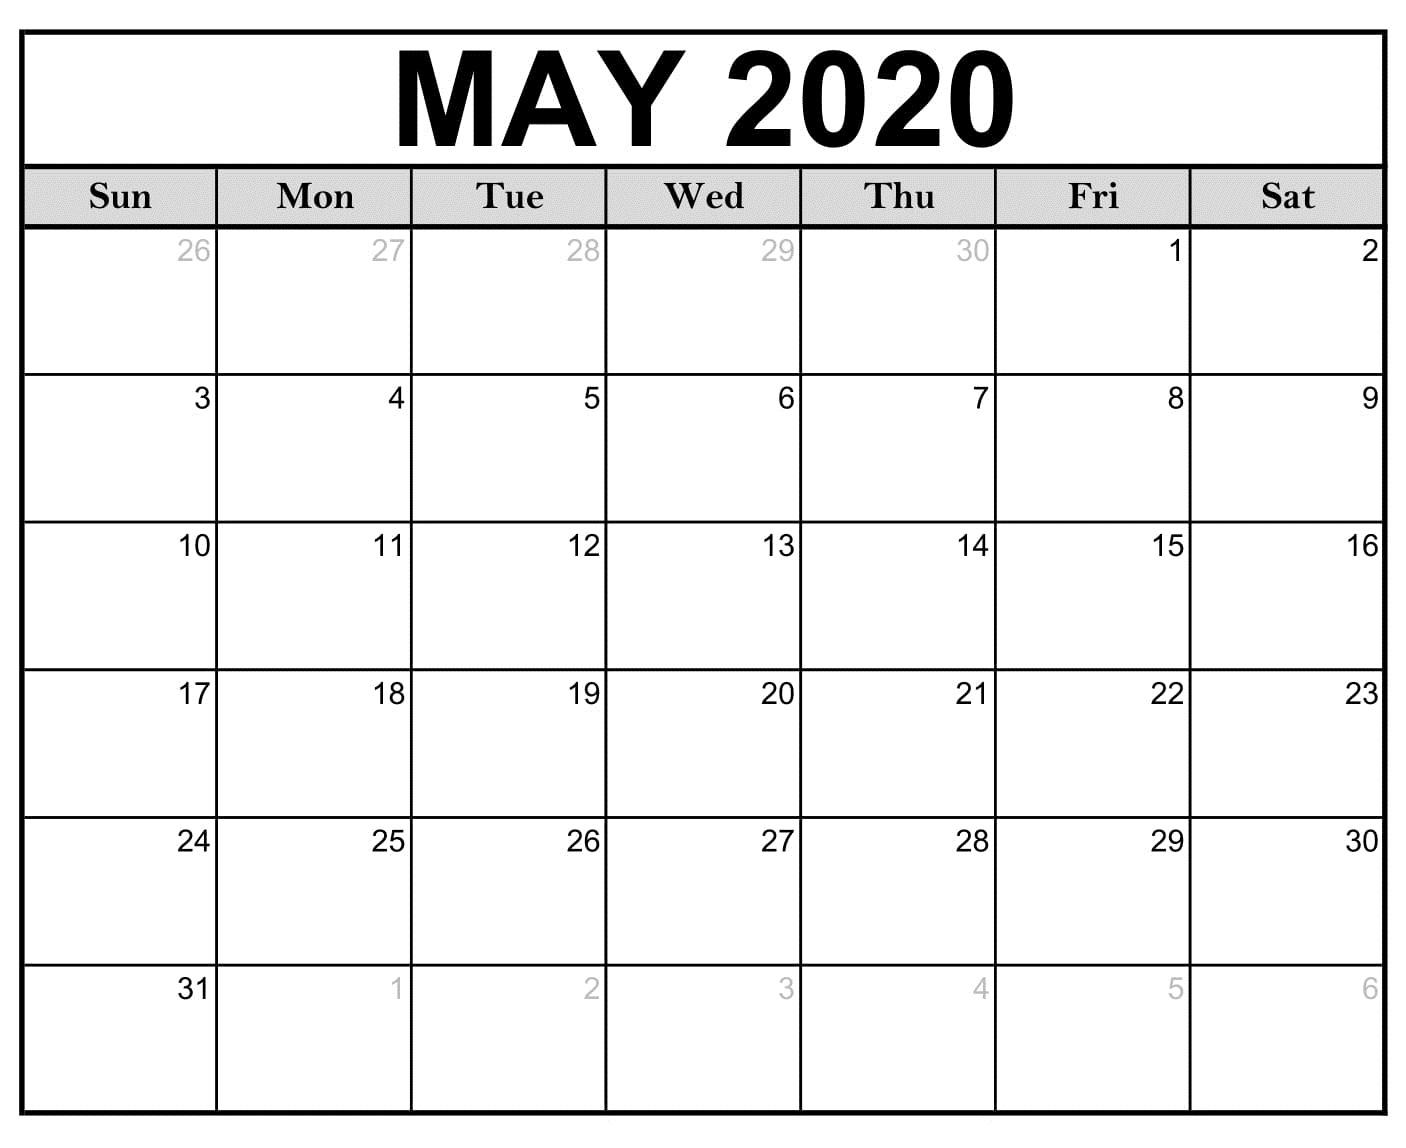 PDF May 2020 Calendar Template